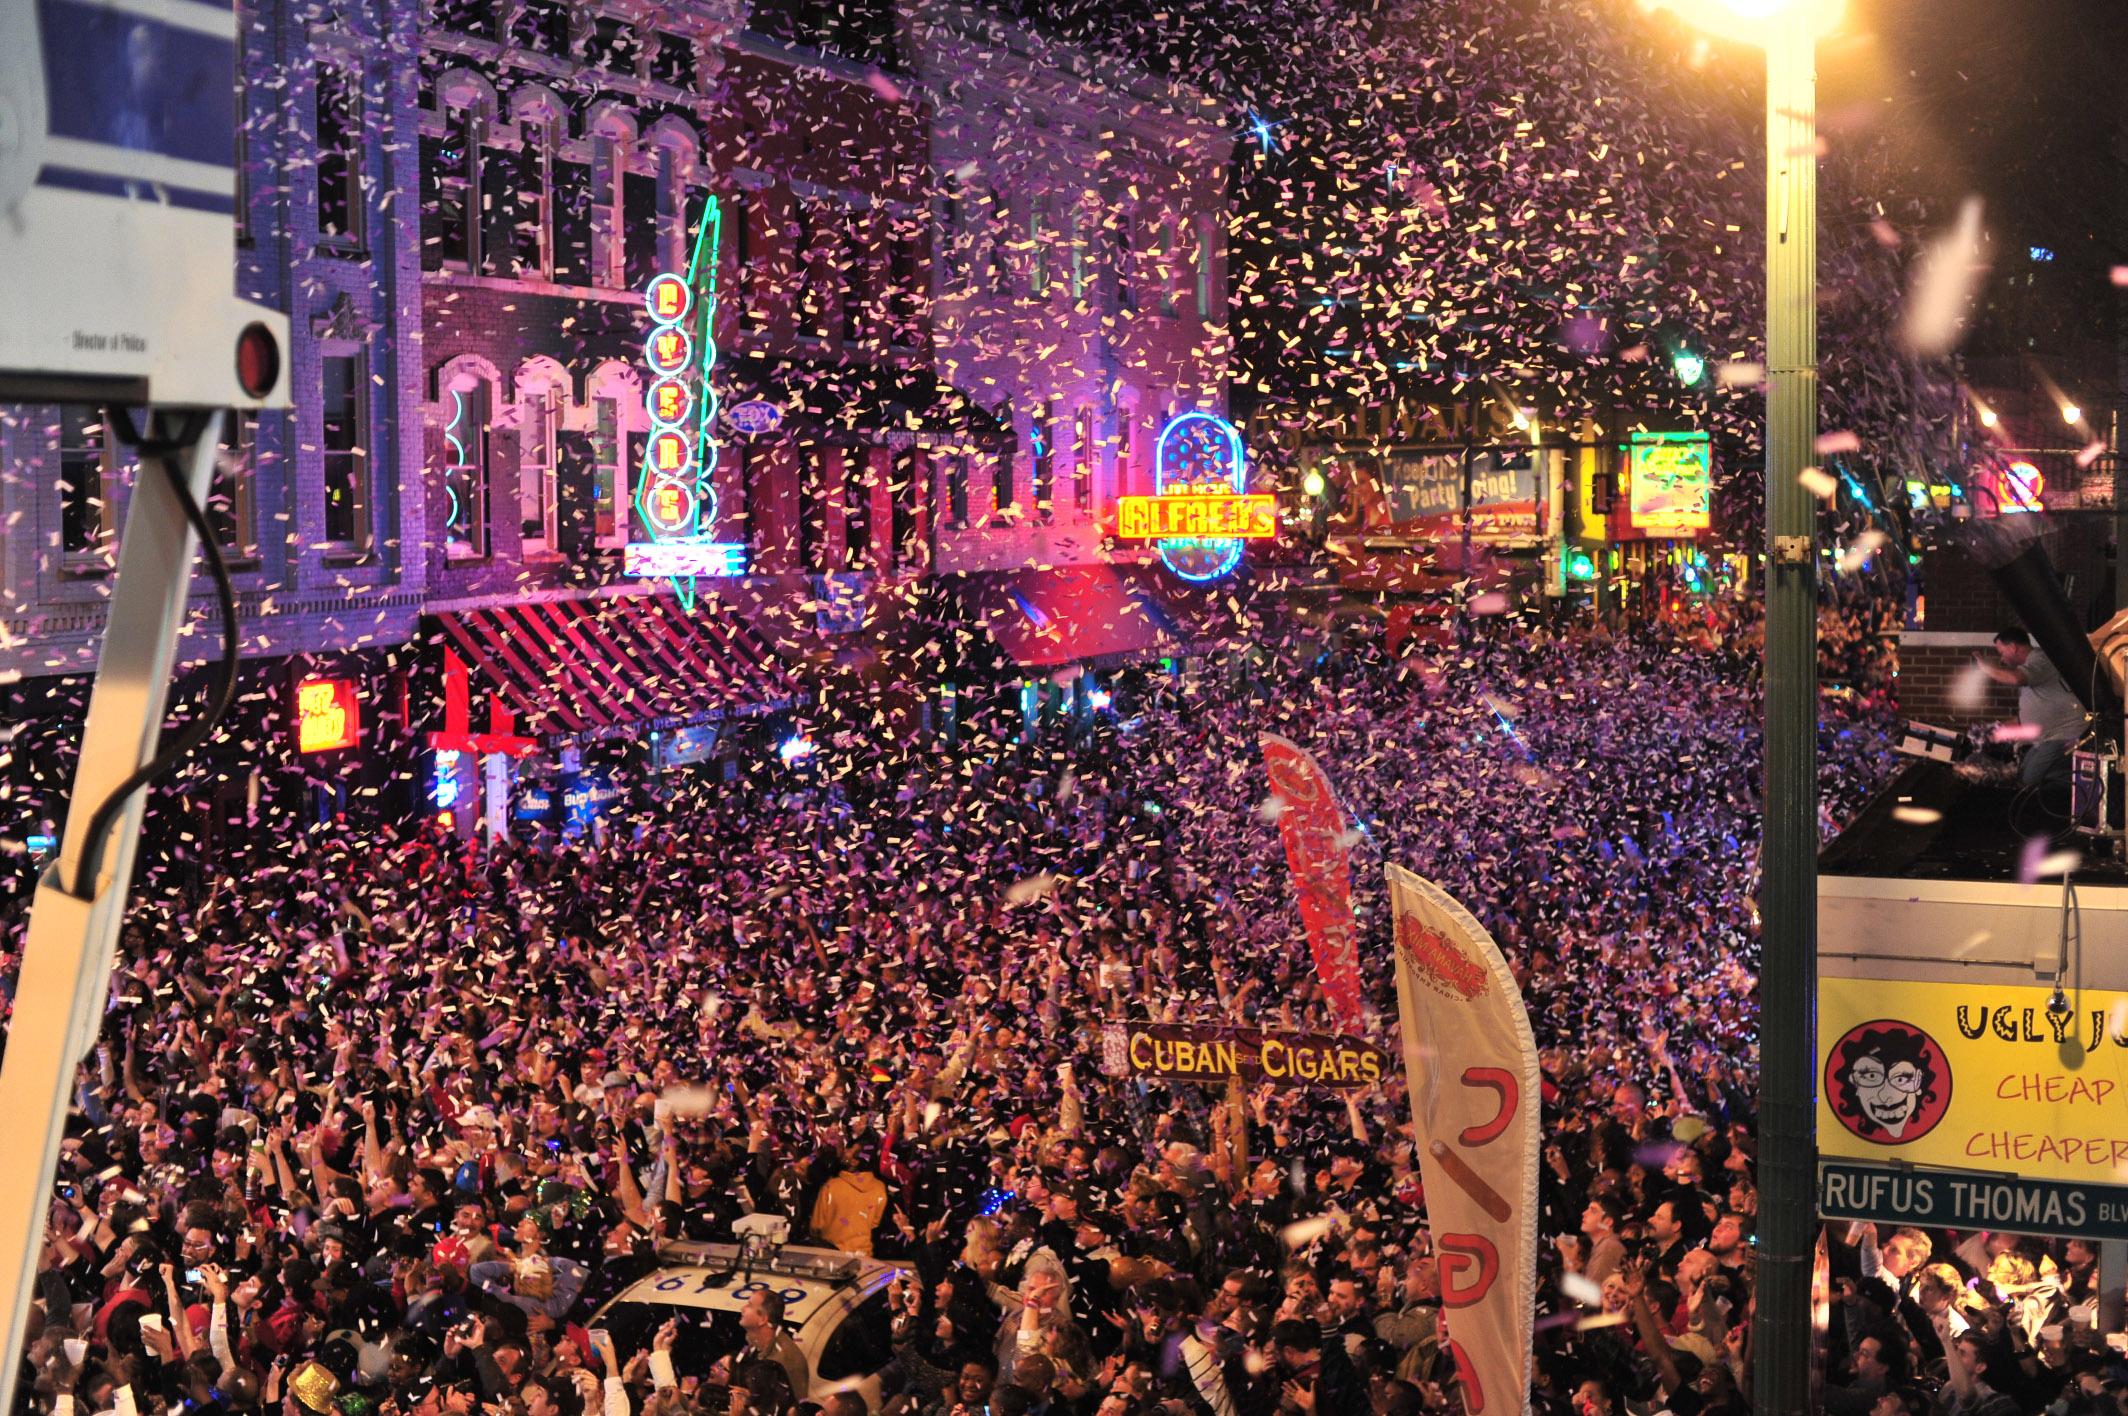 Beale Street New Years Eve